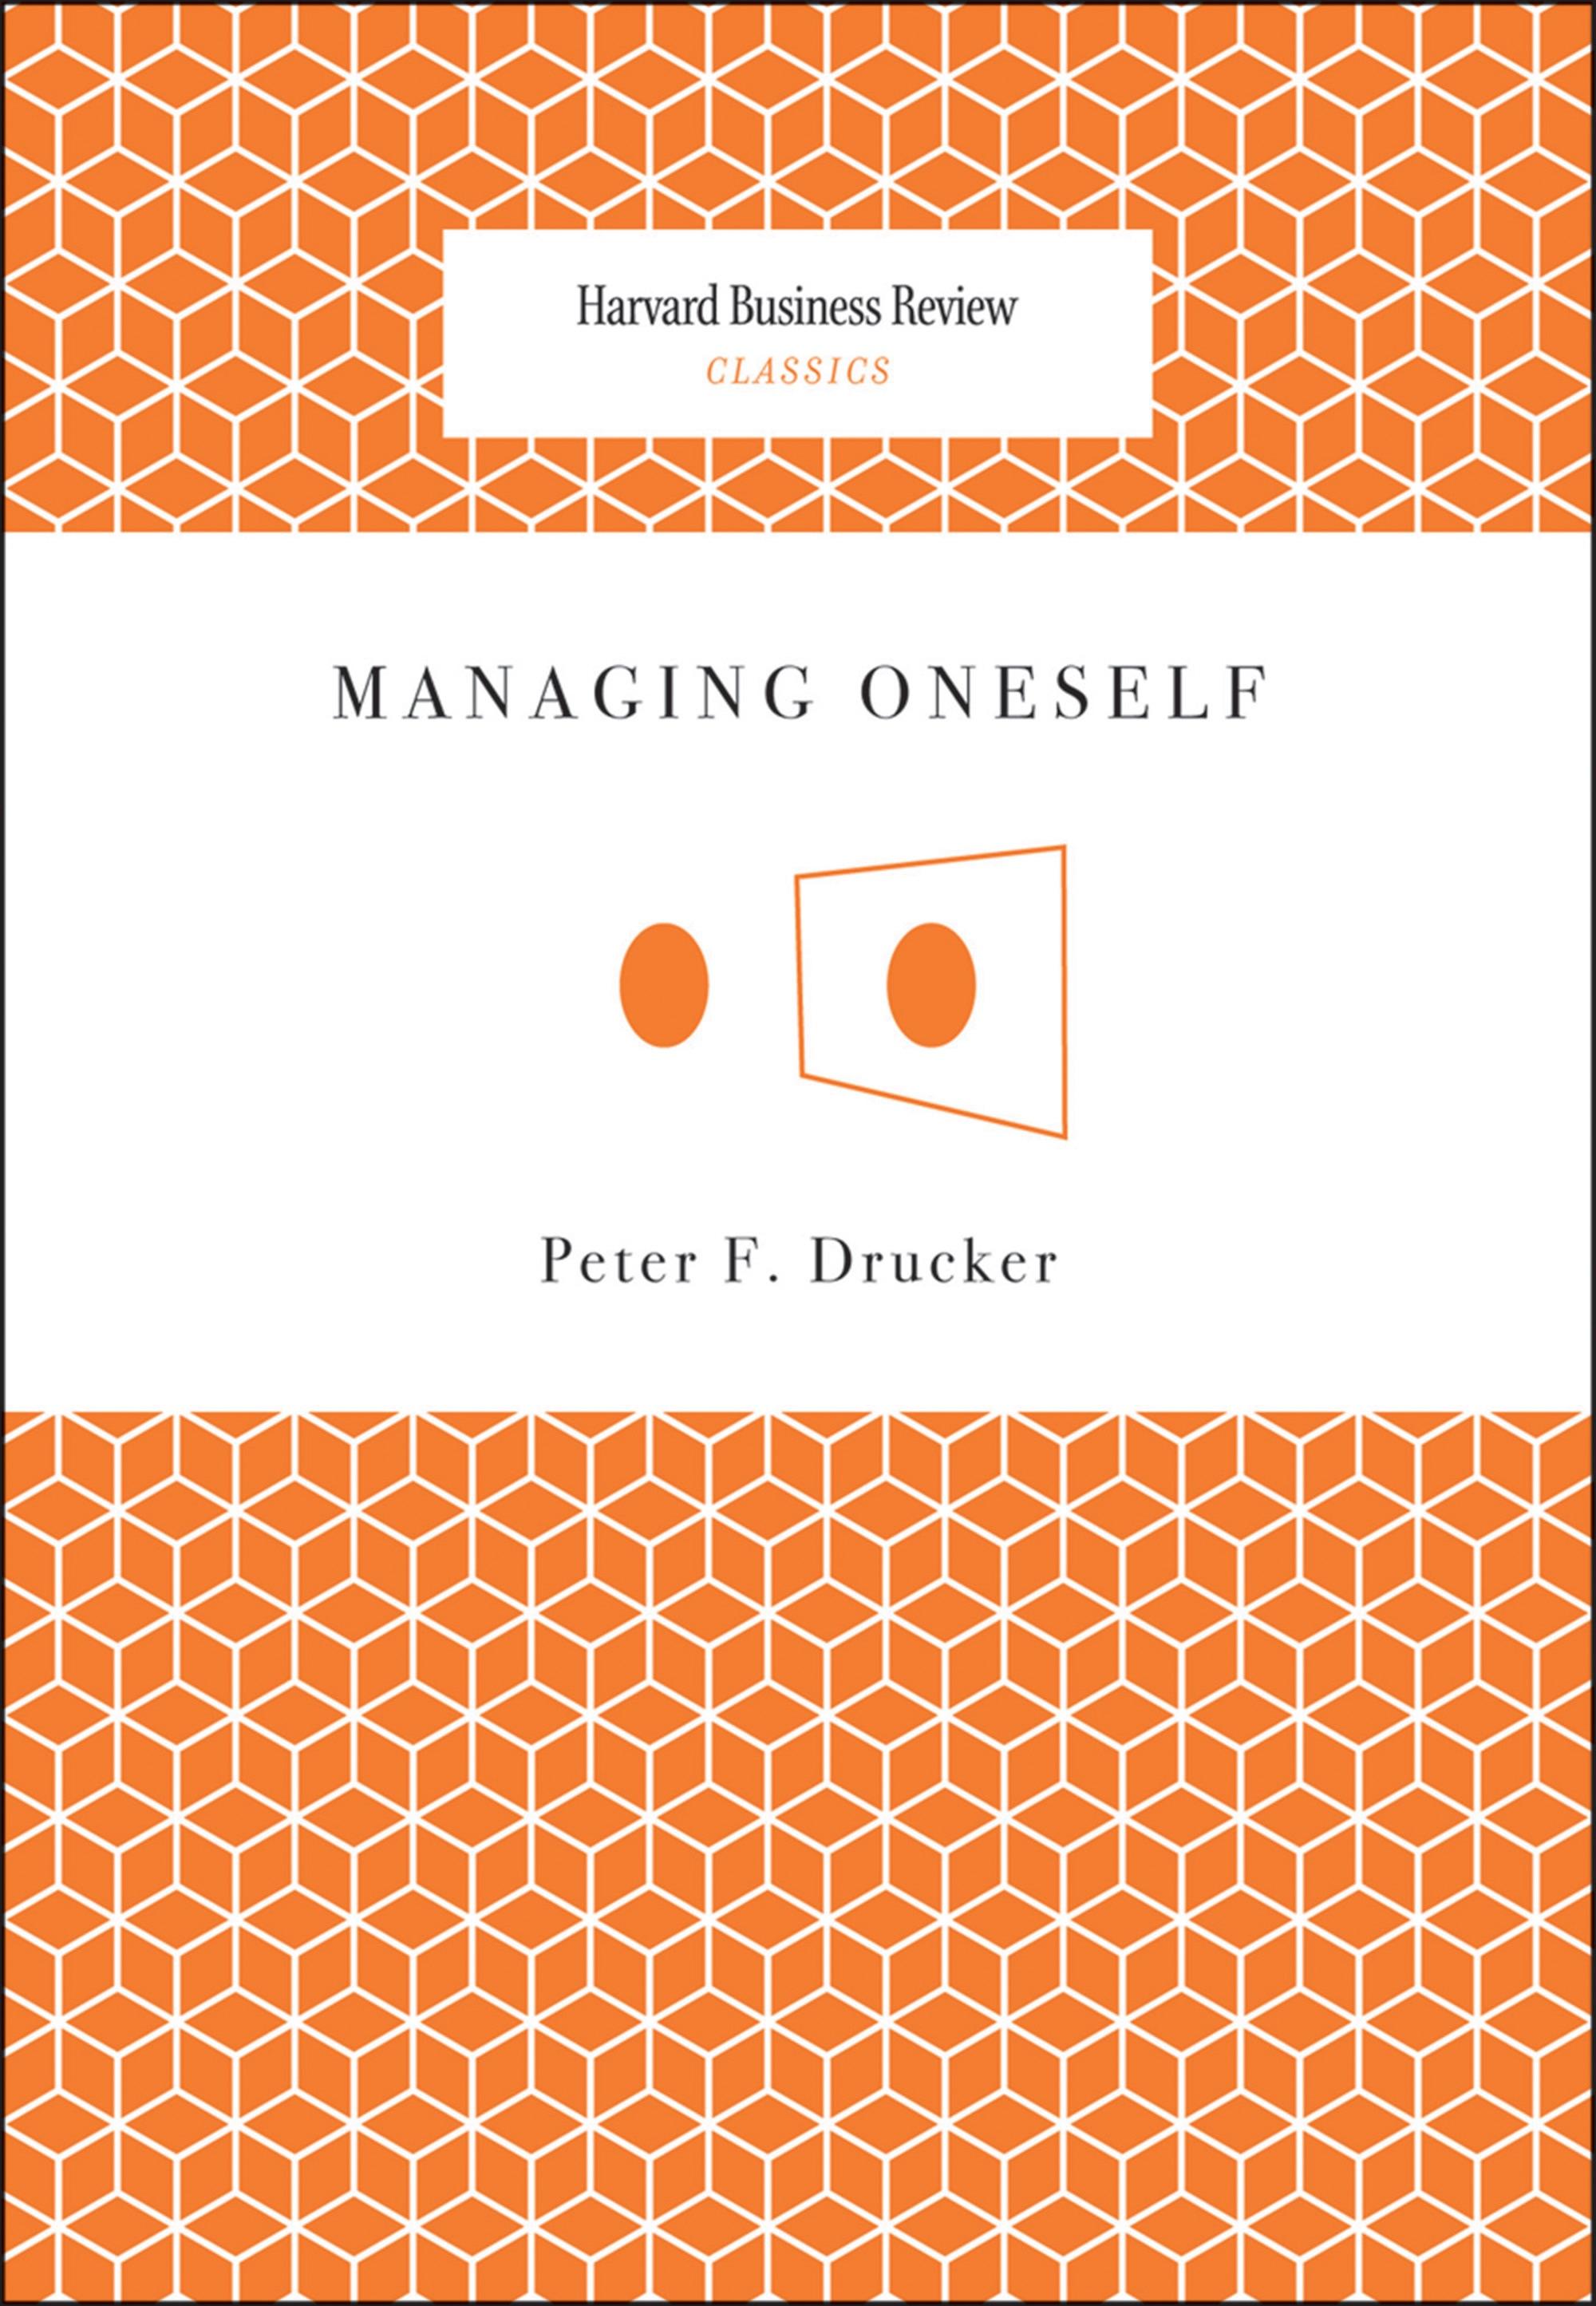 Book Cover of Managing Oneself